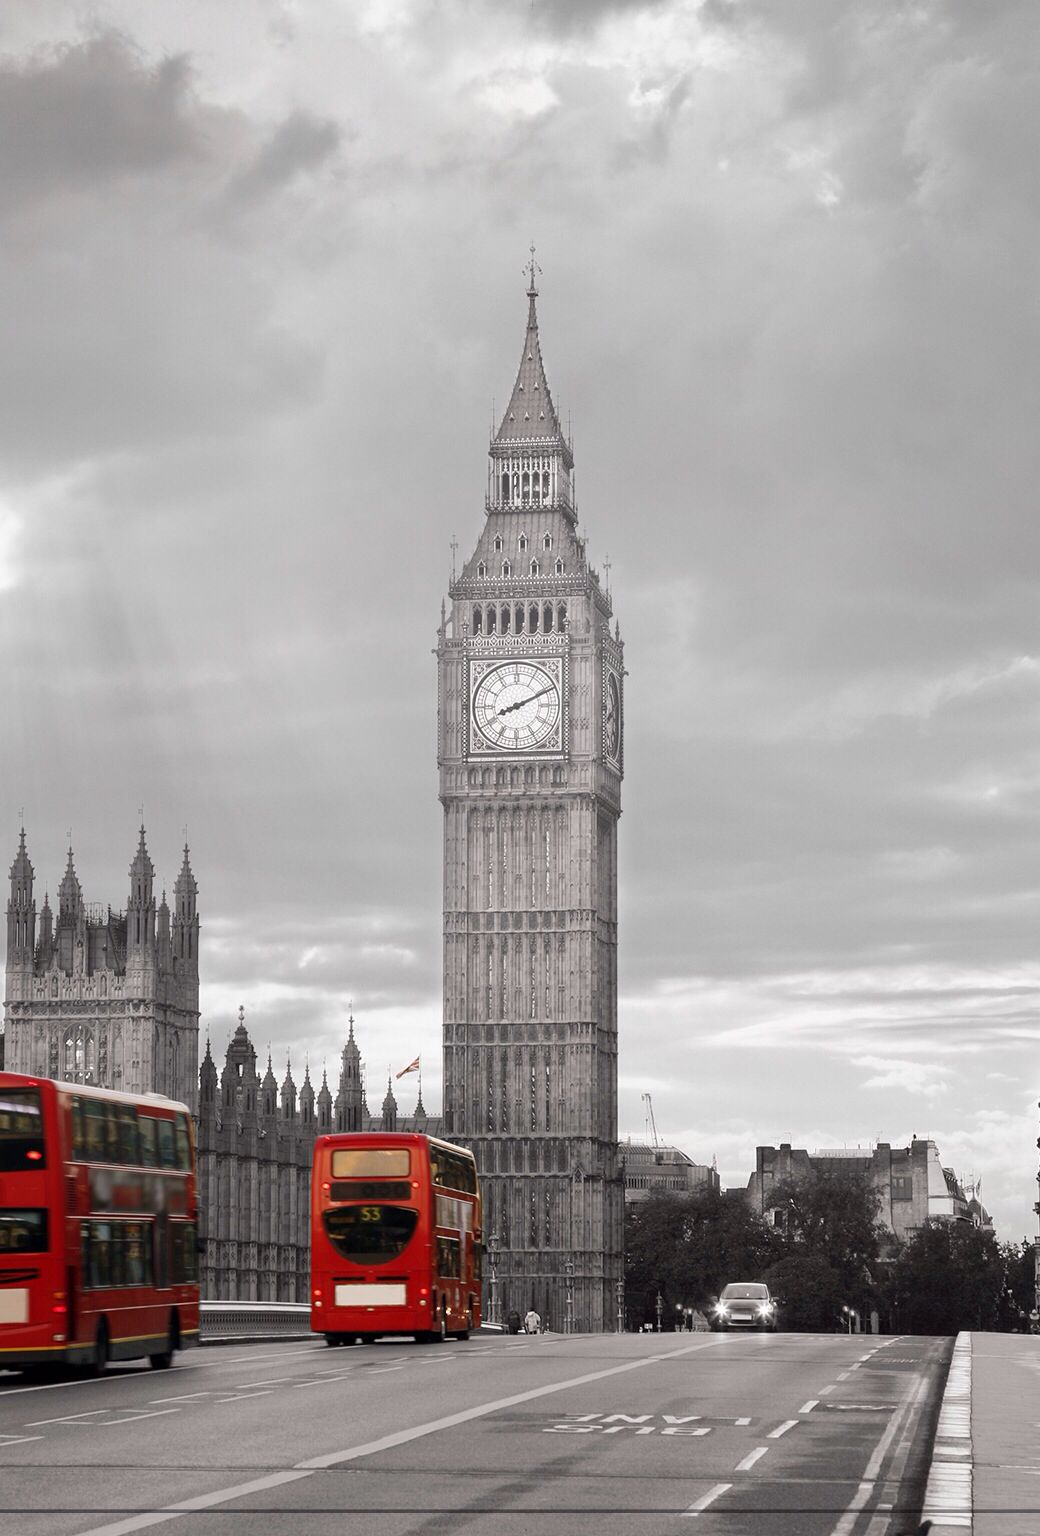 Cool background london wallpaper big ben london